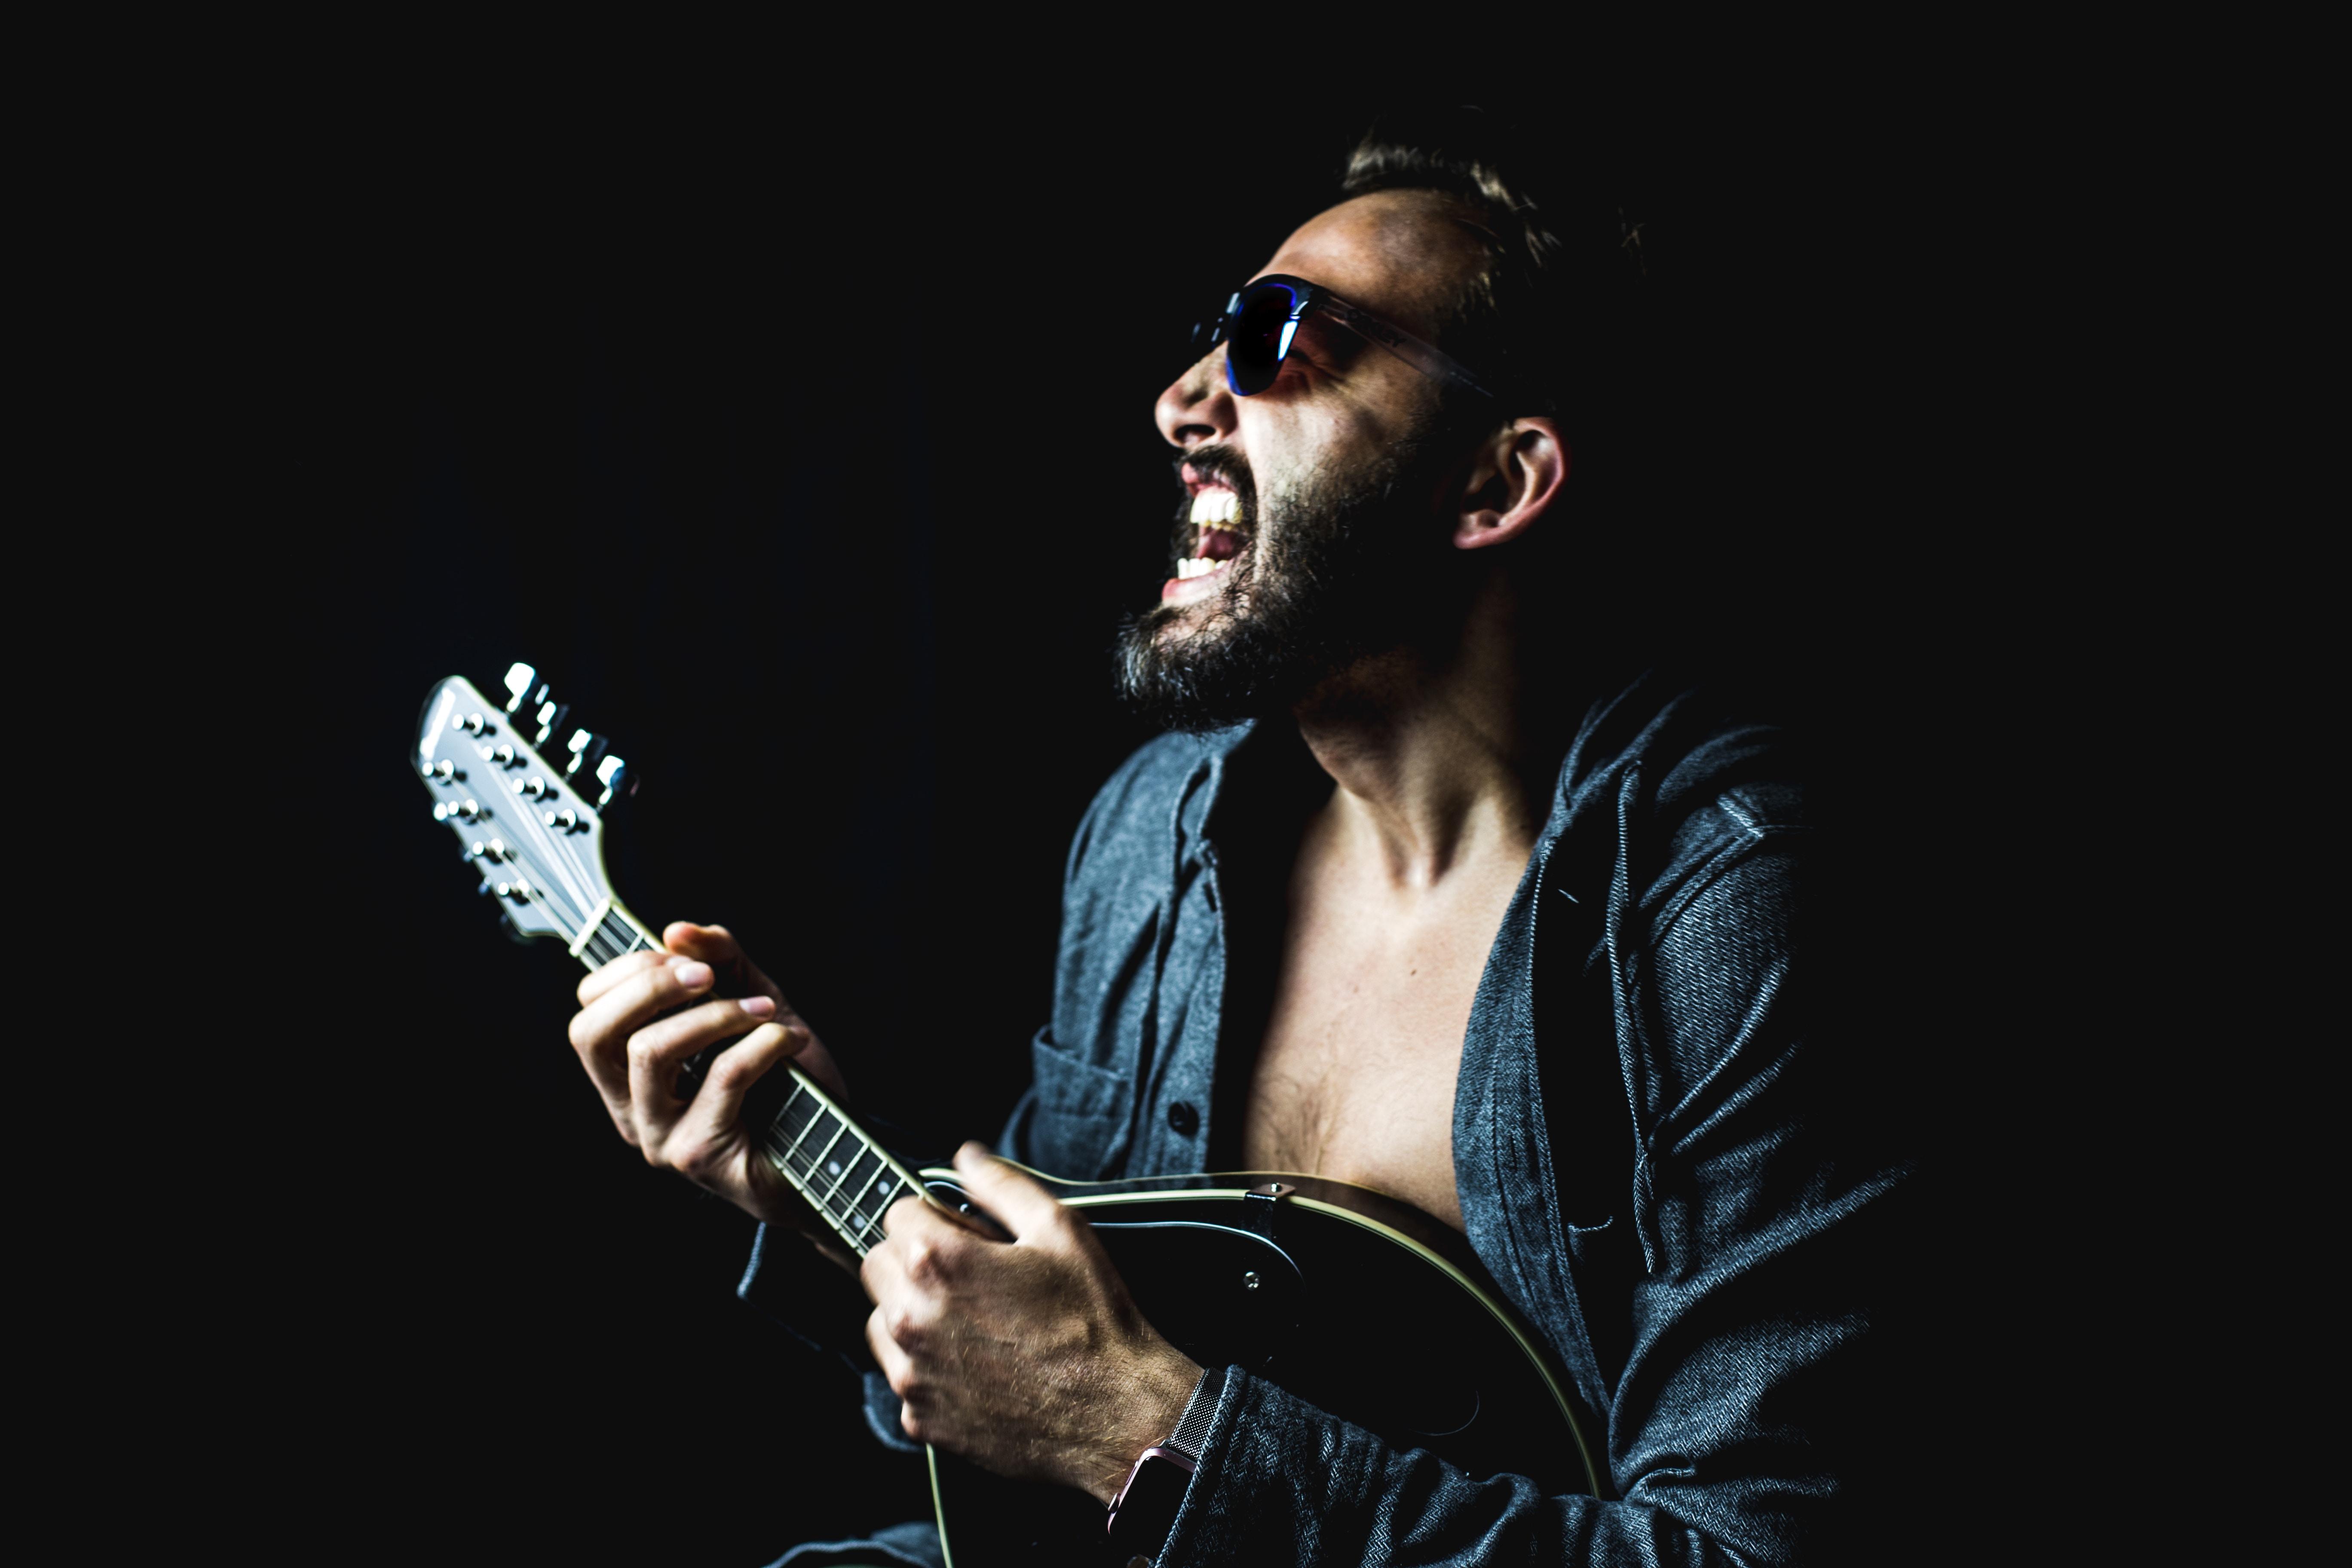 man playing string instrument